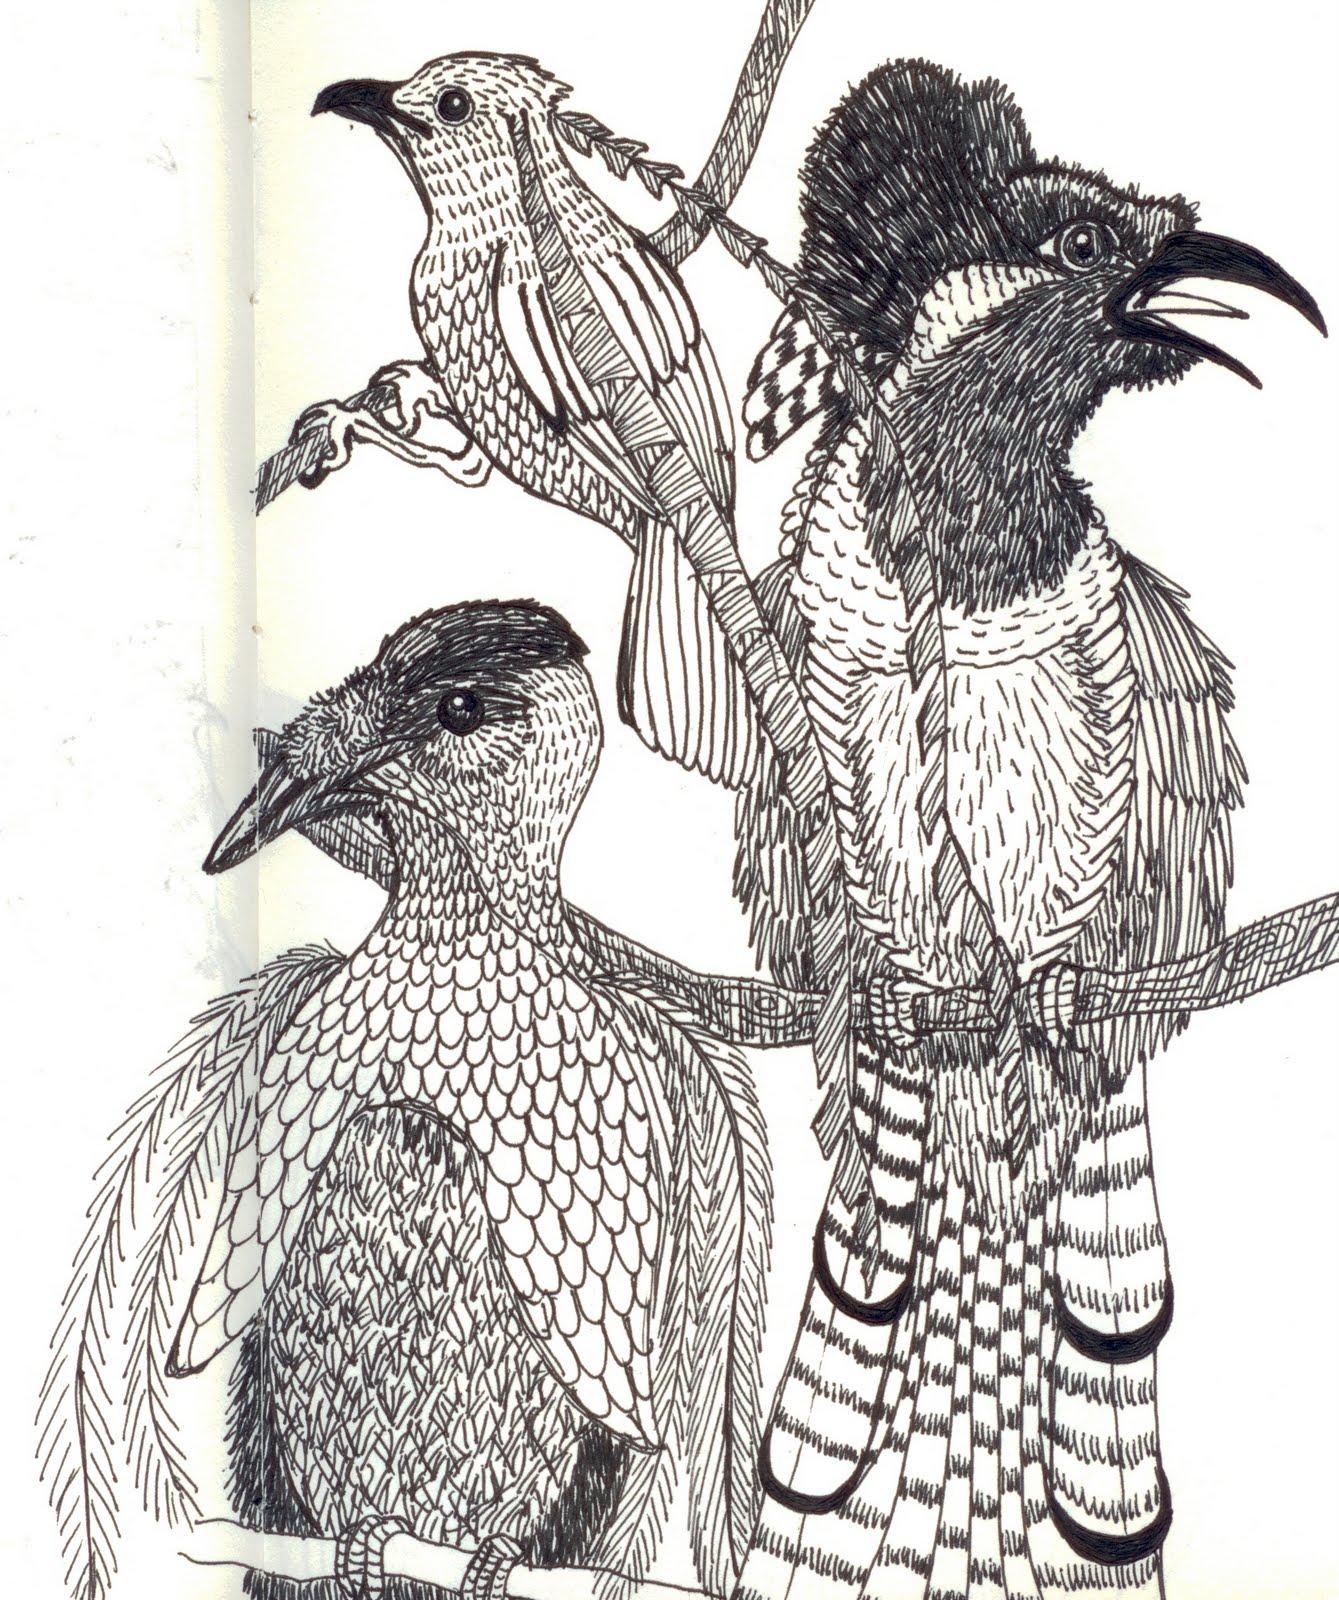 Emma Cowley Illustration: Half and Half Competition